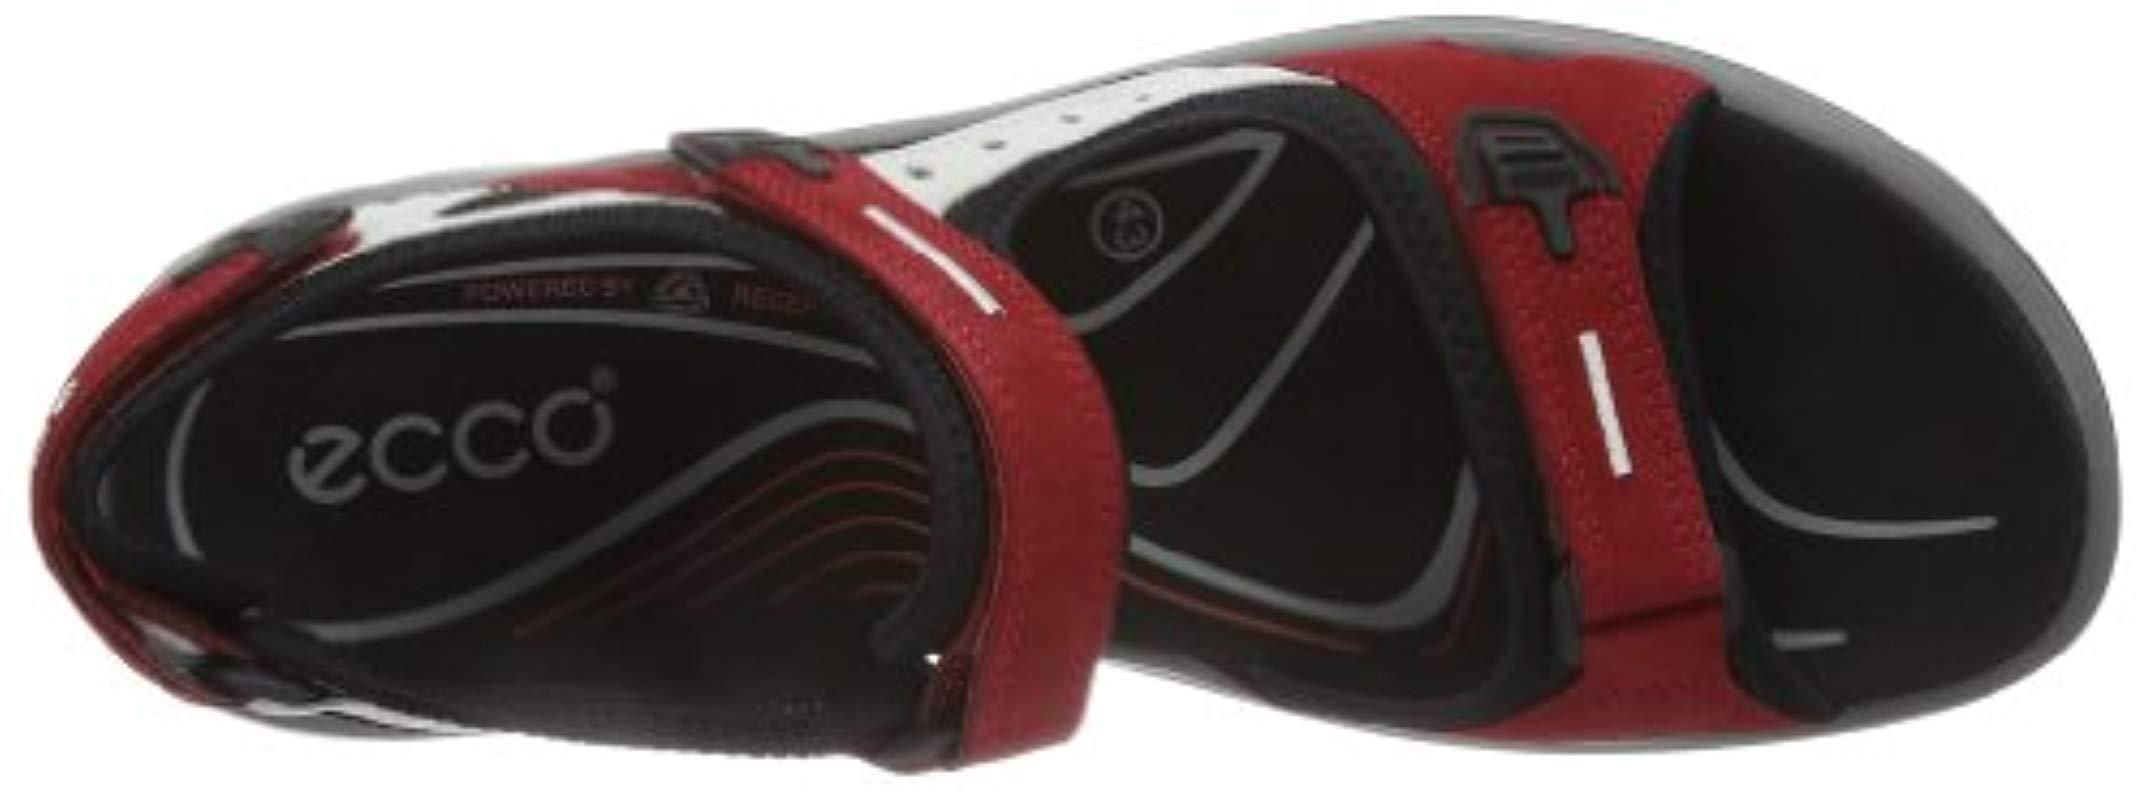 huge discount f1c39 b6018 Ecco Schuhe Damen Sandalen Trekkingsandalen Offroad Rot Chili Red  06956355287